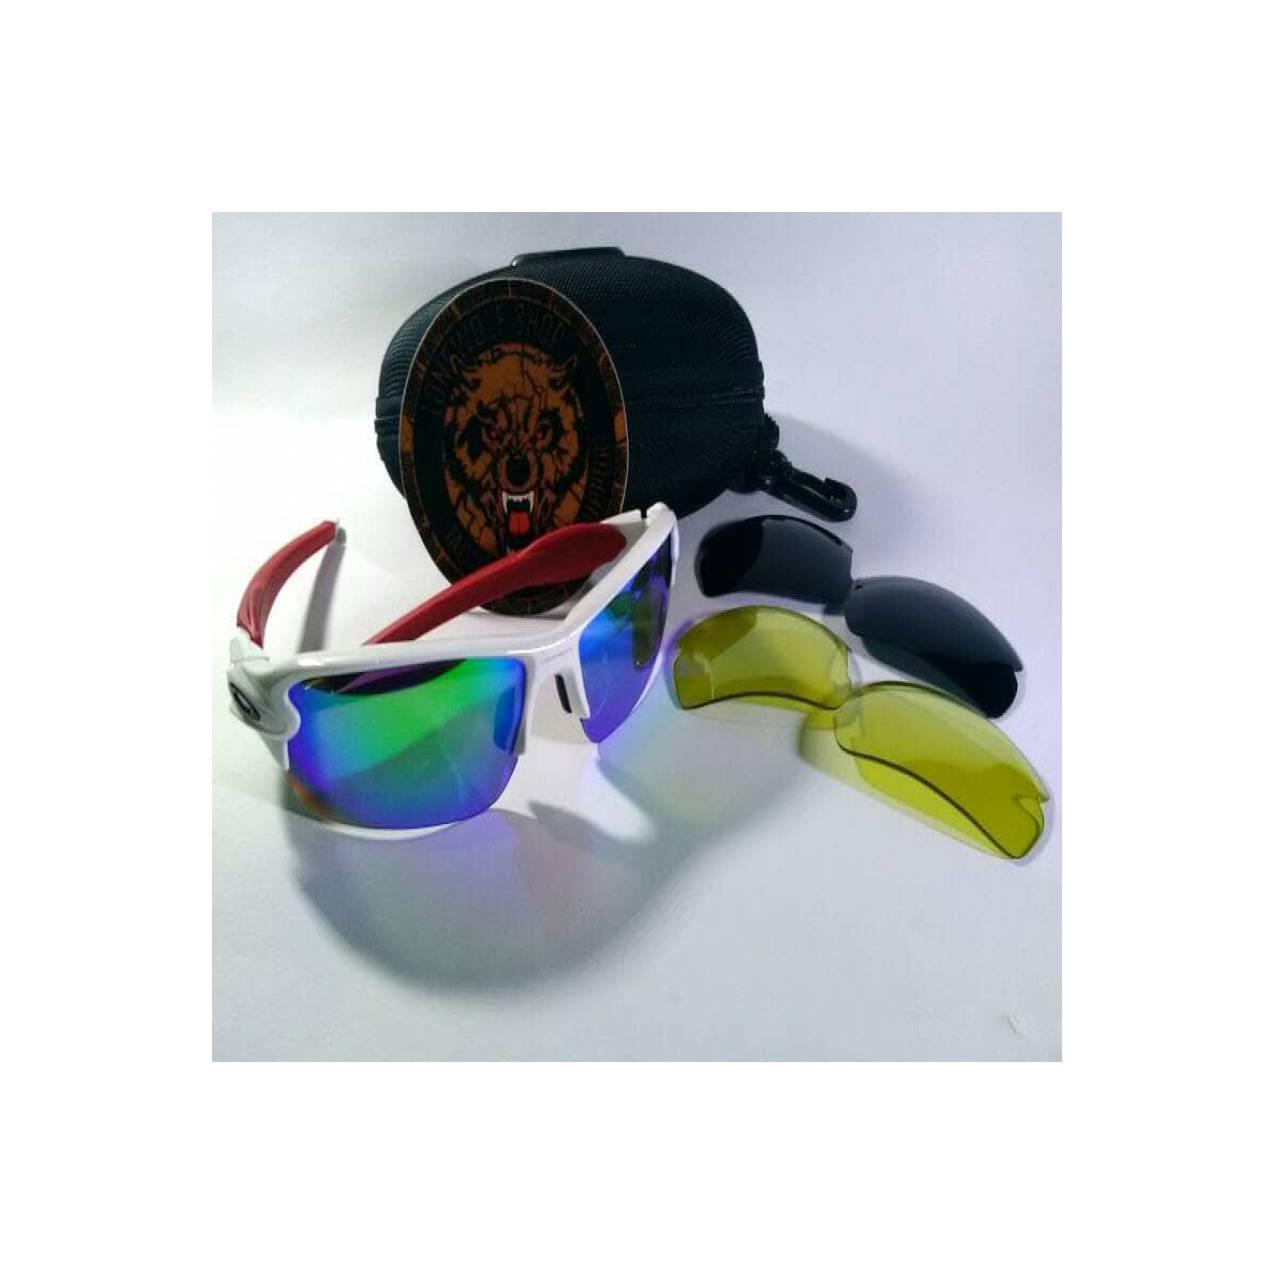 Kacamata Oakley FLAK Versi 2.0 (Frame Putih Merah)